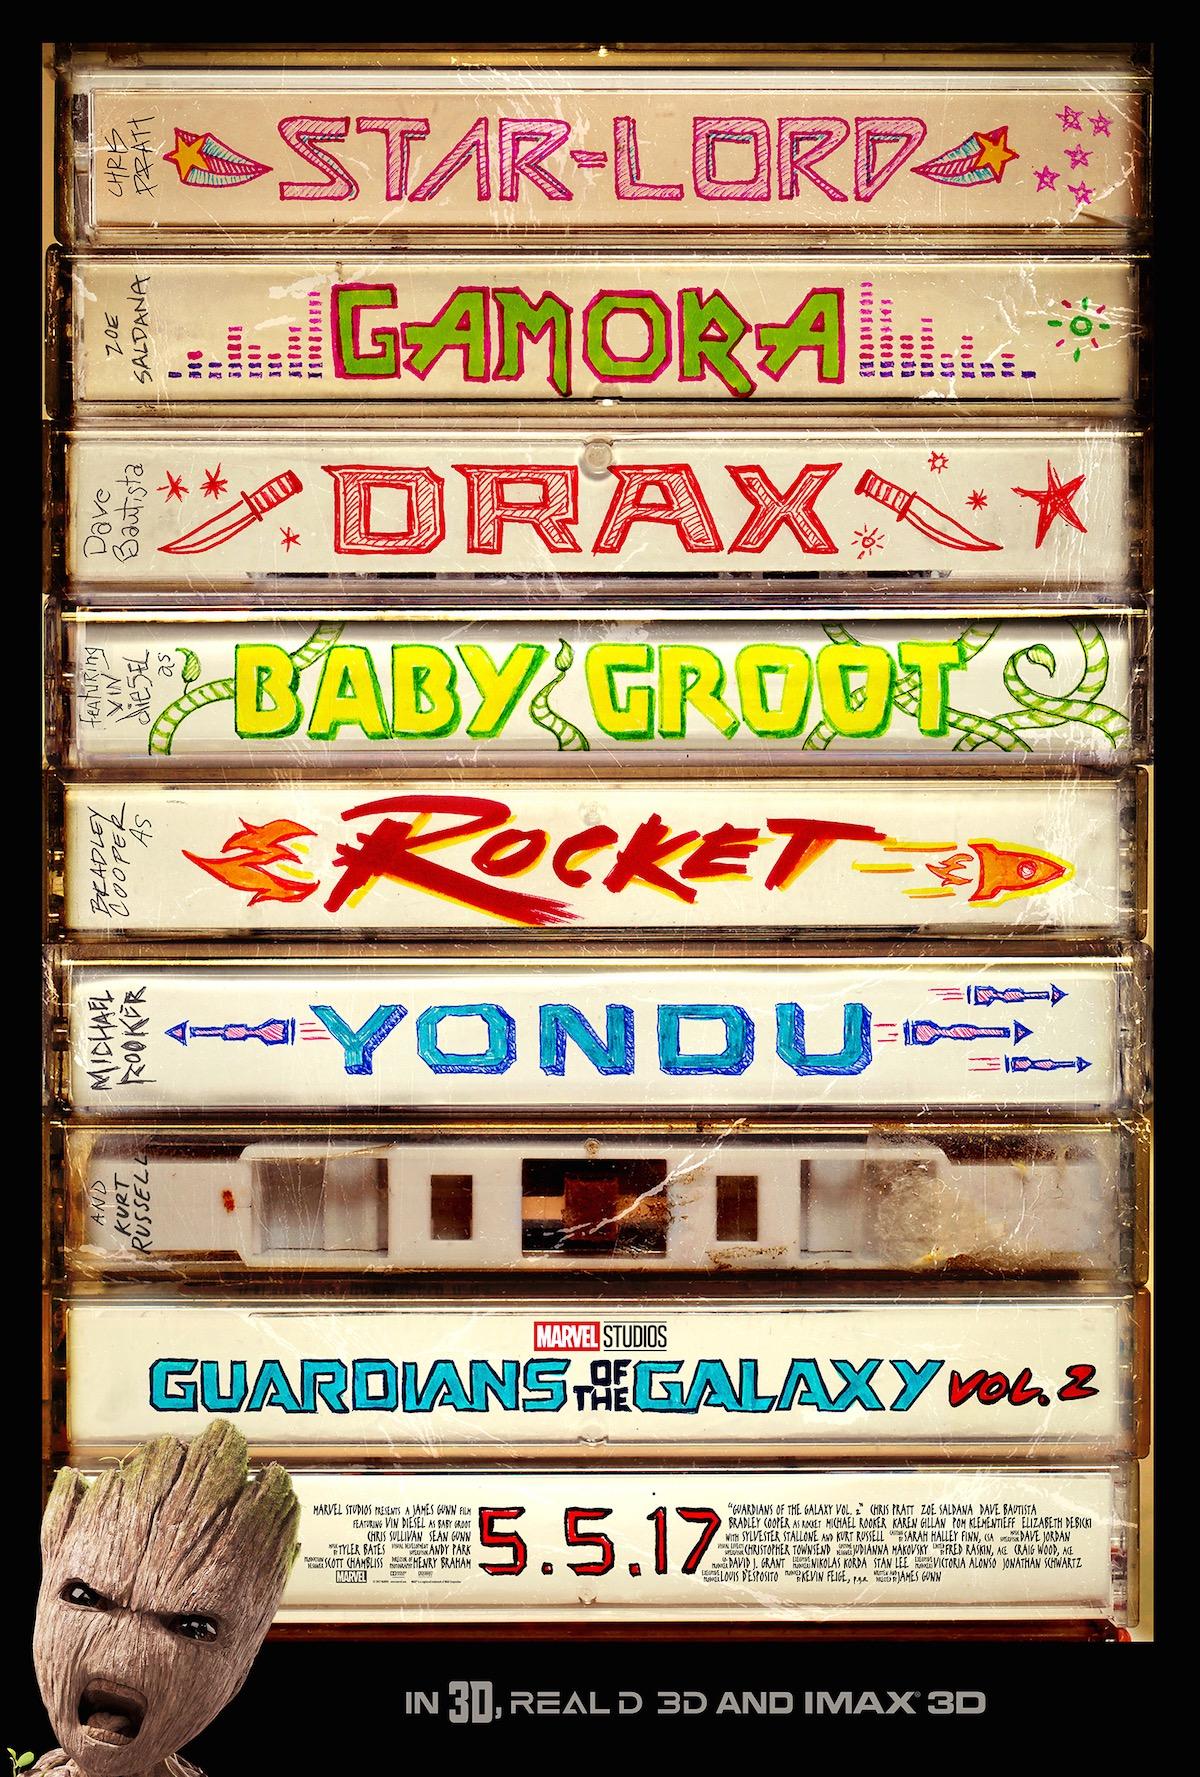 szmk_galaxis_orzoi_guardians_galaxy_poster_1.jpg